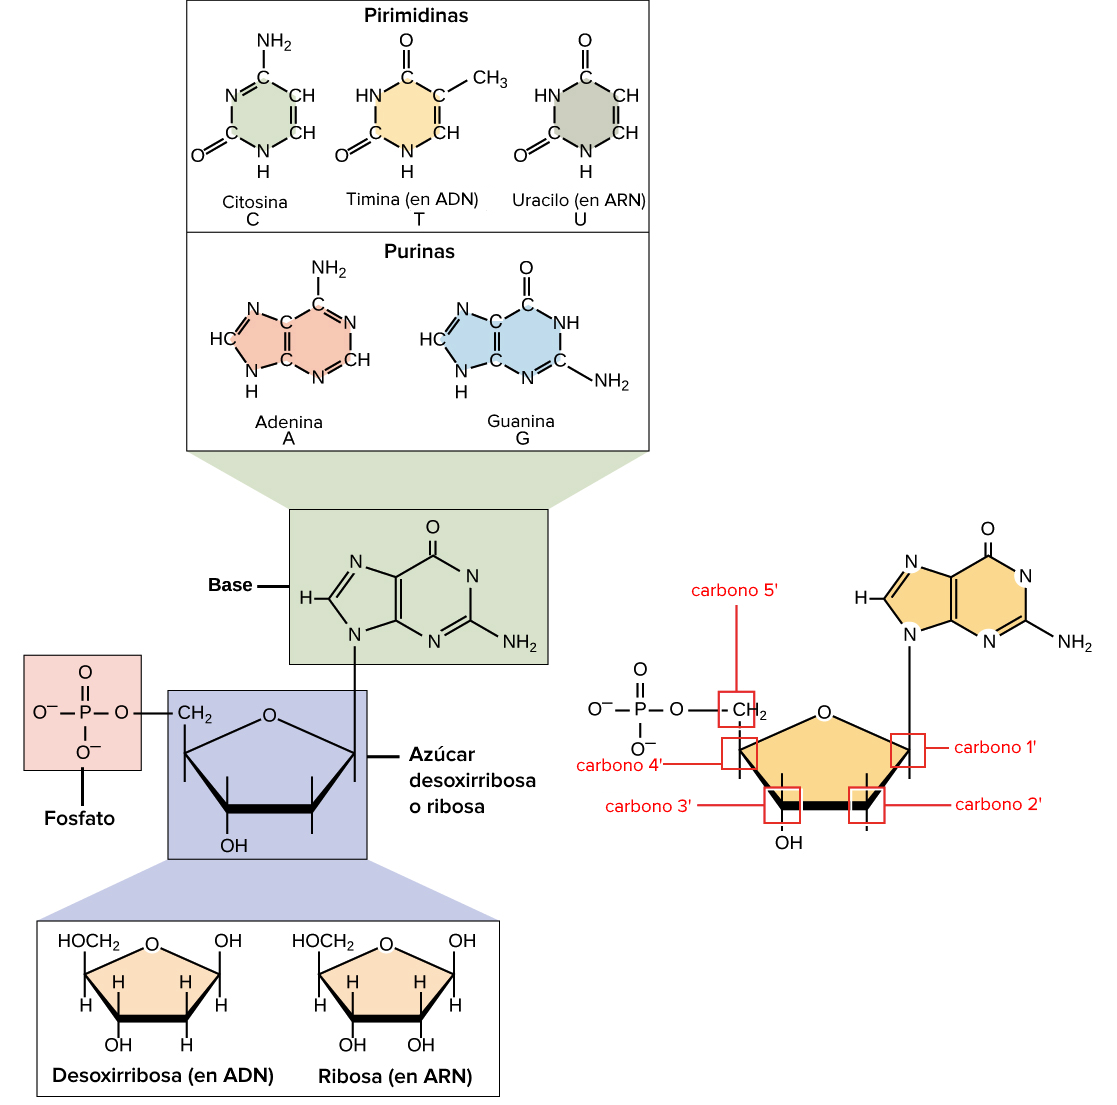 Nucleic Acid Macromolecule Diagram Data Wiring Diagrams Mizuho Taco Slot Blog P U00e1gina 4 F U00cdsica Y Biolog U00cda Lipid Acids Of